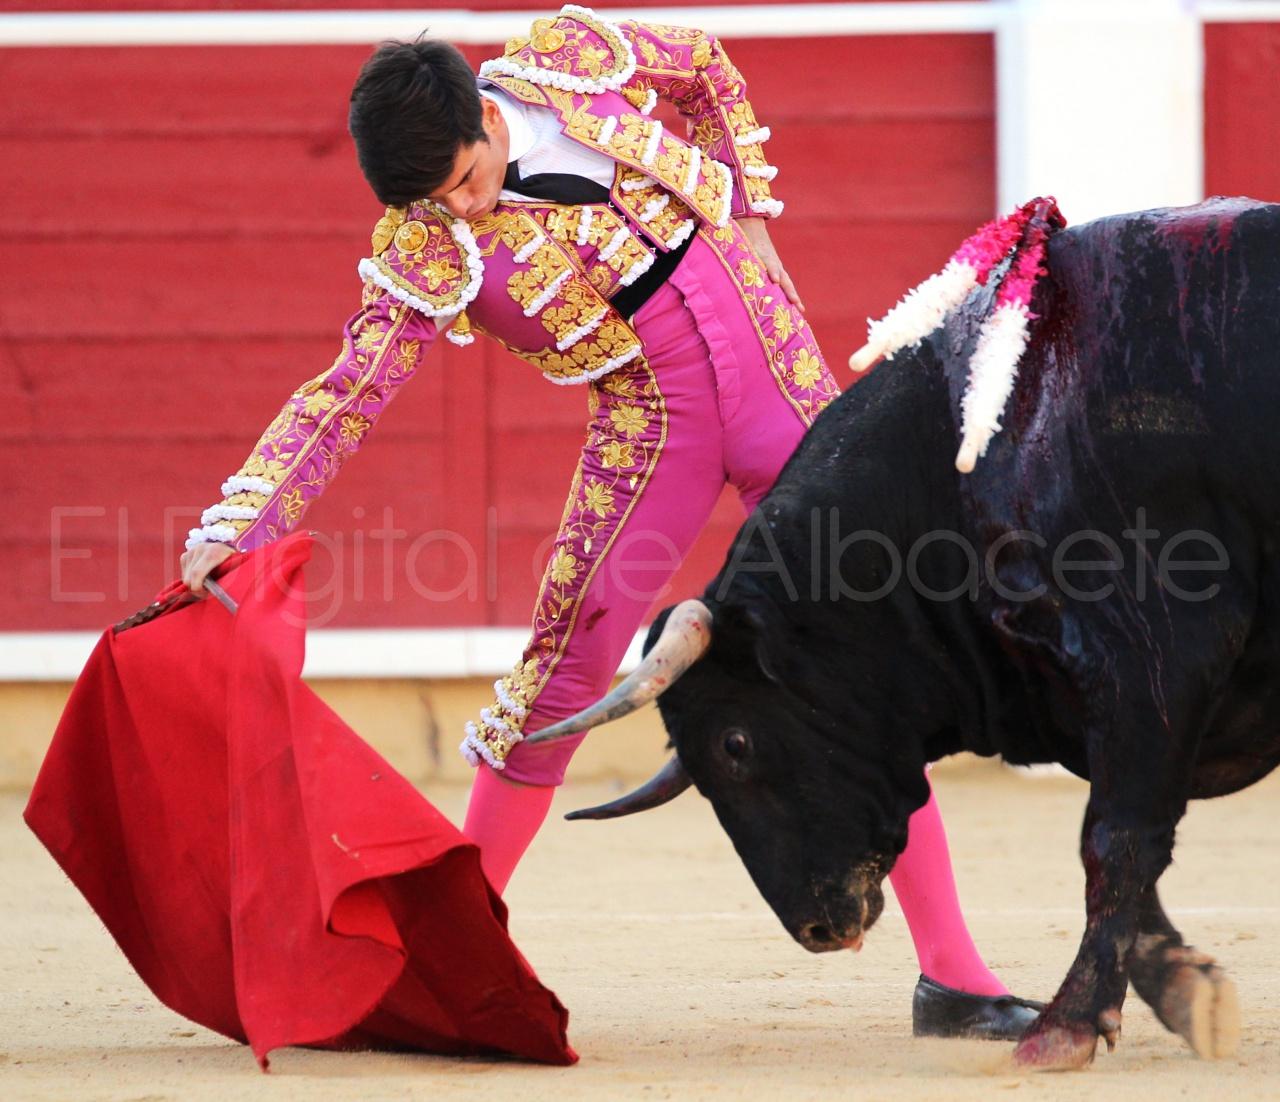 El Juli Lopez Simon y Garrido Feria Albacete 2015 toros  71